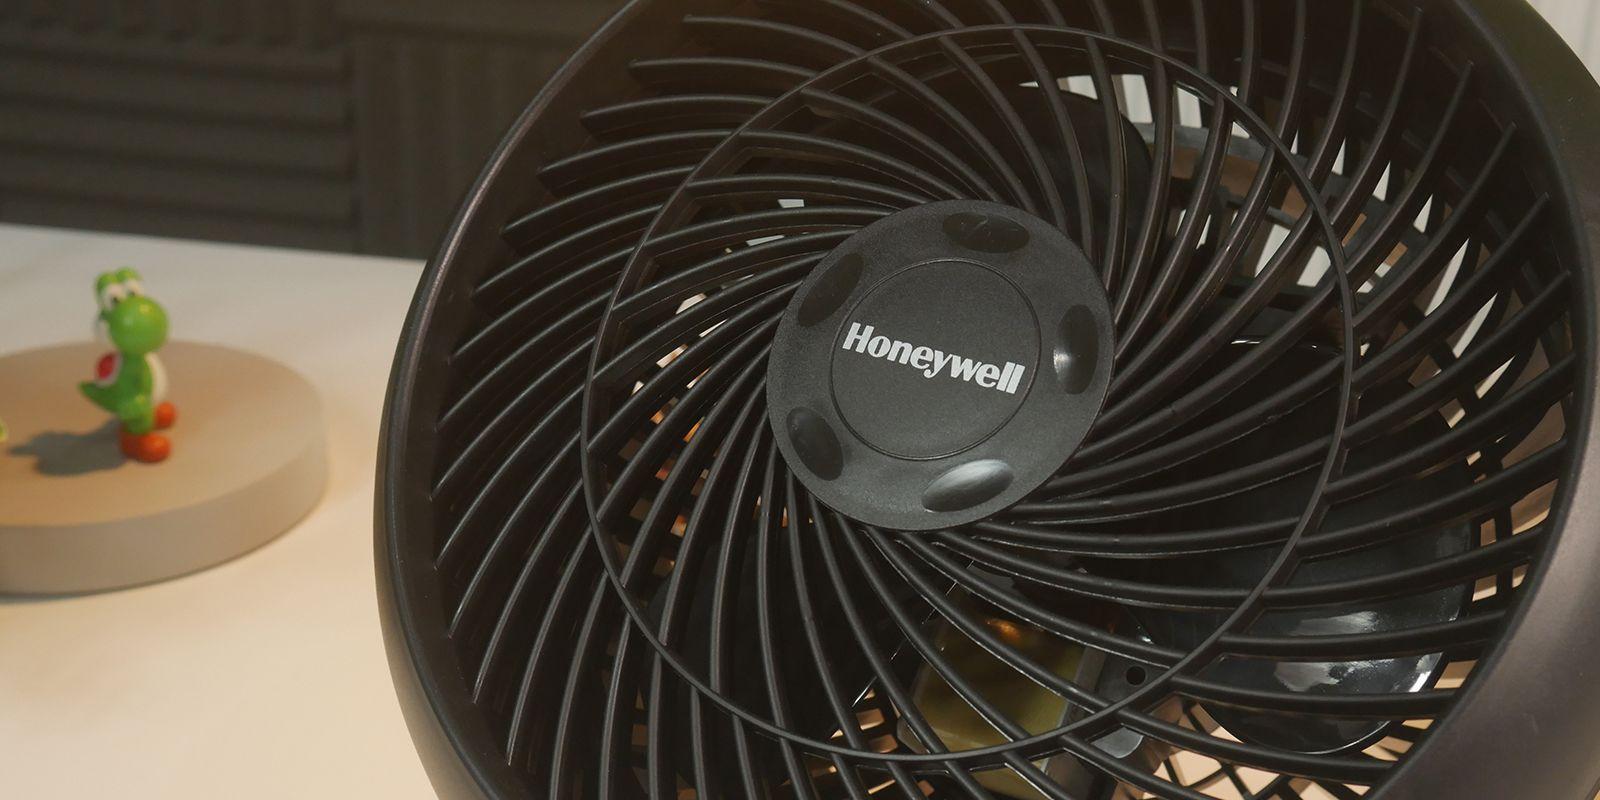 Honeywell HT-900E